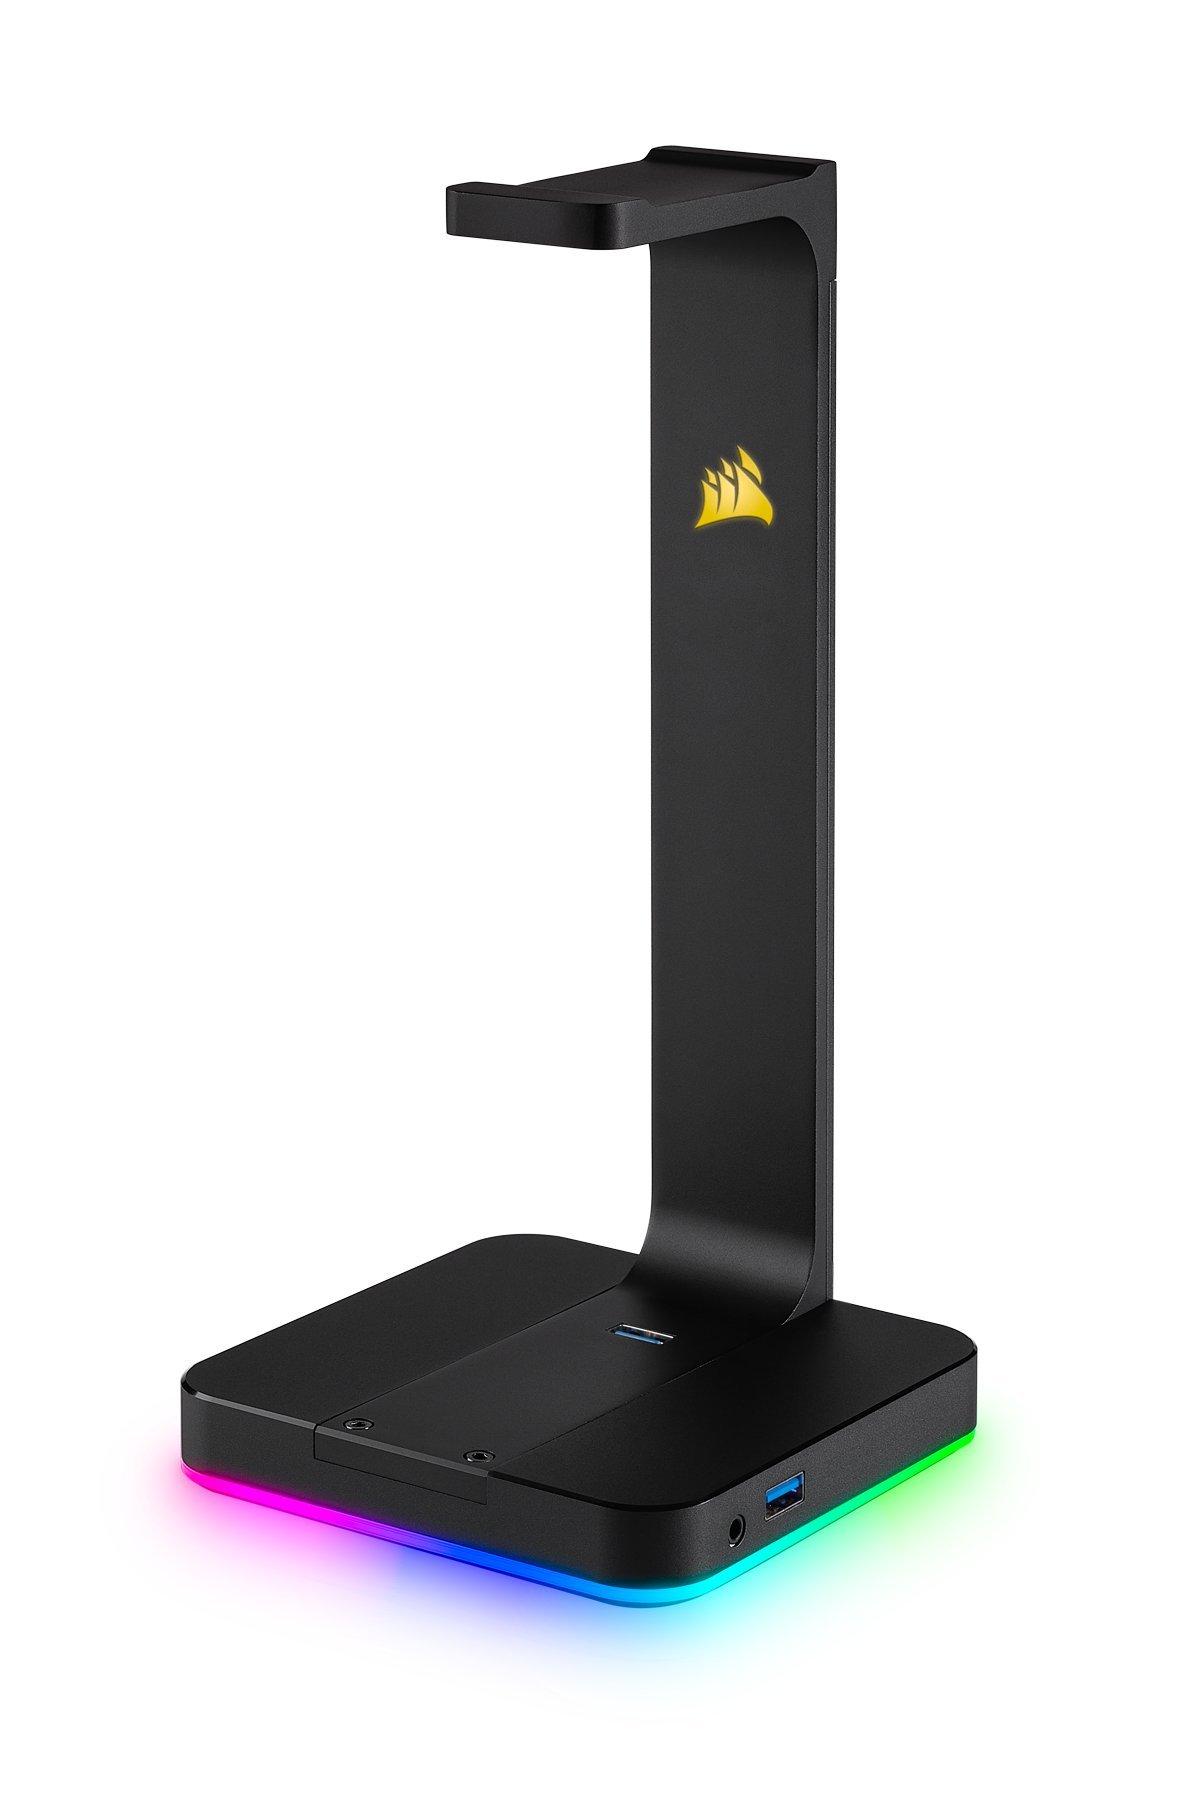 Corsair ST100 RGB - Premium RGB Gaming Headset Stand with 7.1 Surround Sound Headphone Audio - 3.5mm Jack and 2X USB 3.1 Ports